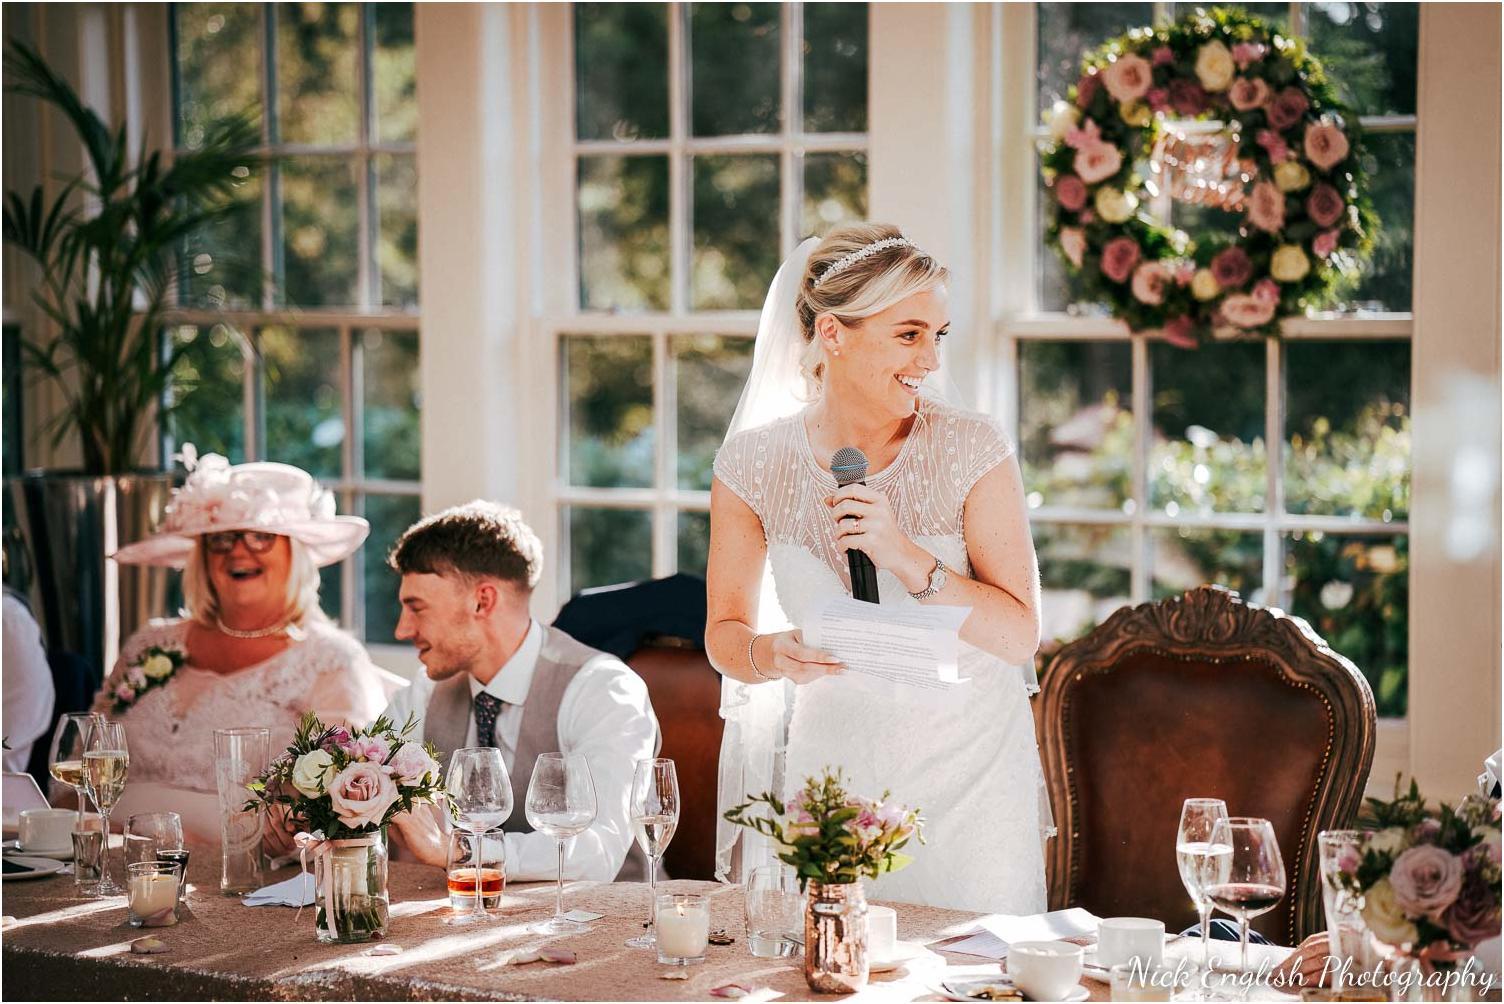 Mitton_Hall_Wedding_Photograph-158.jpg